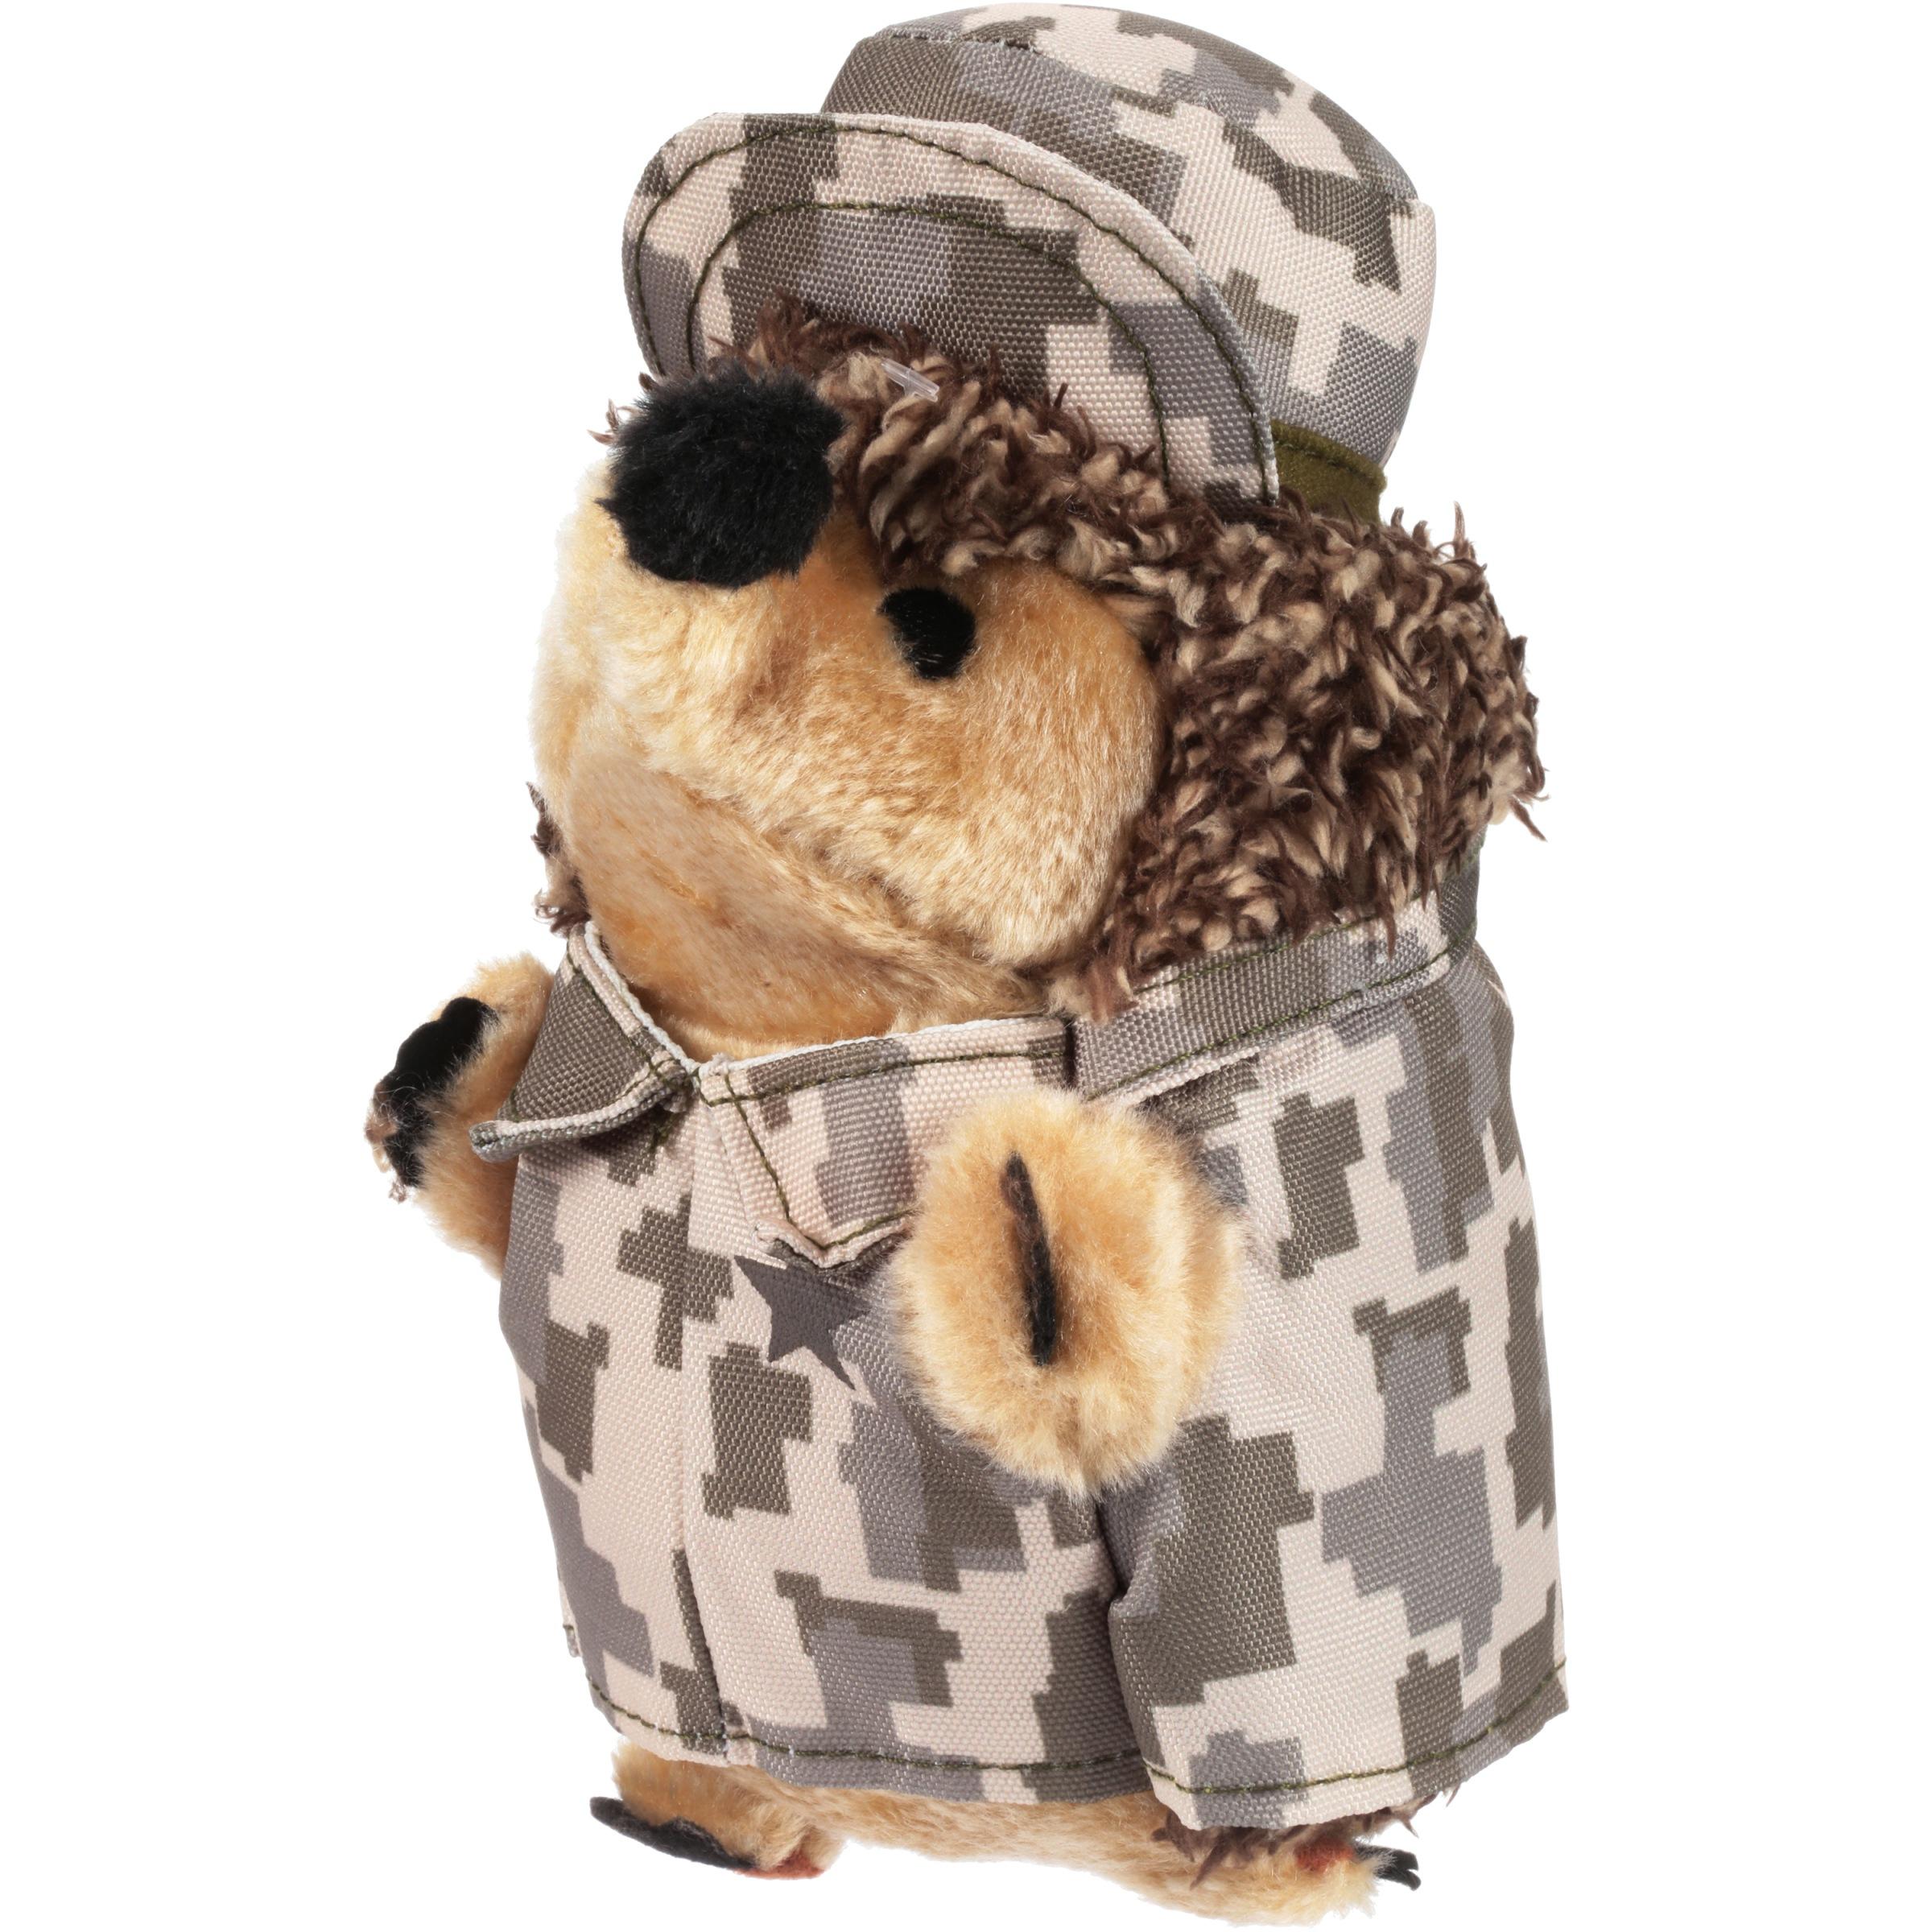 Zoobilee™ Heggies Army Plush Pet Toy